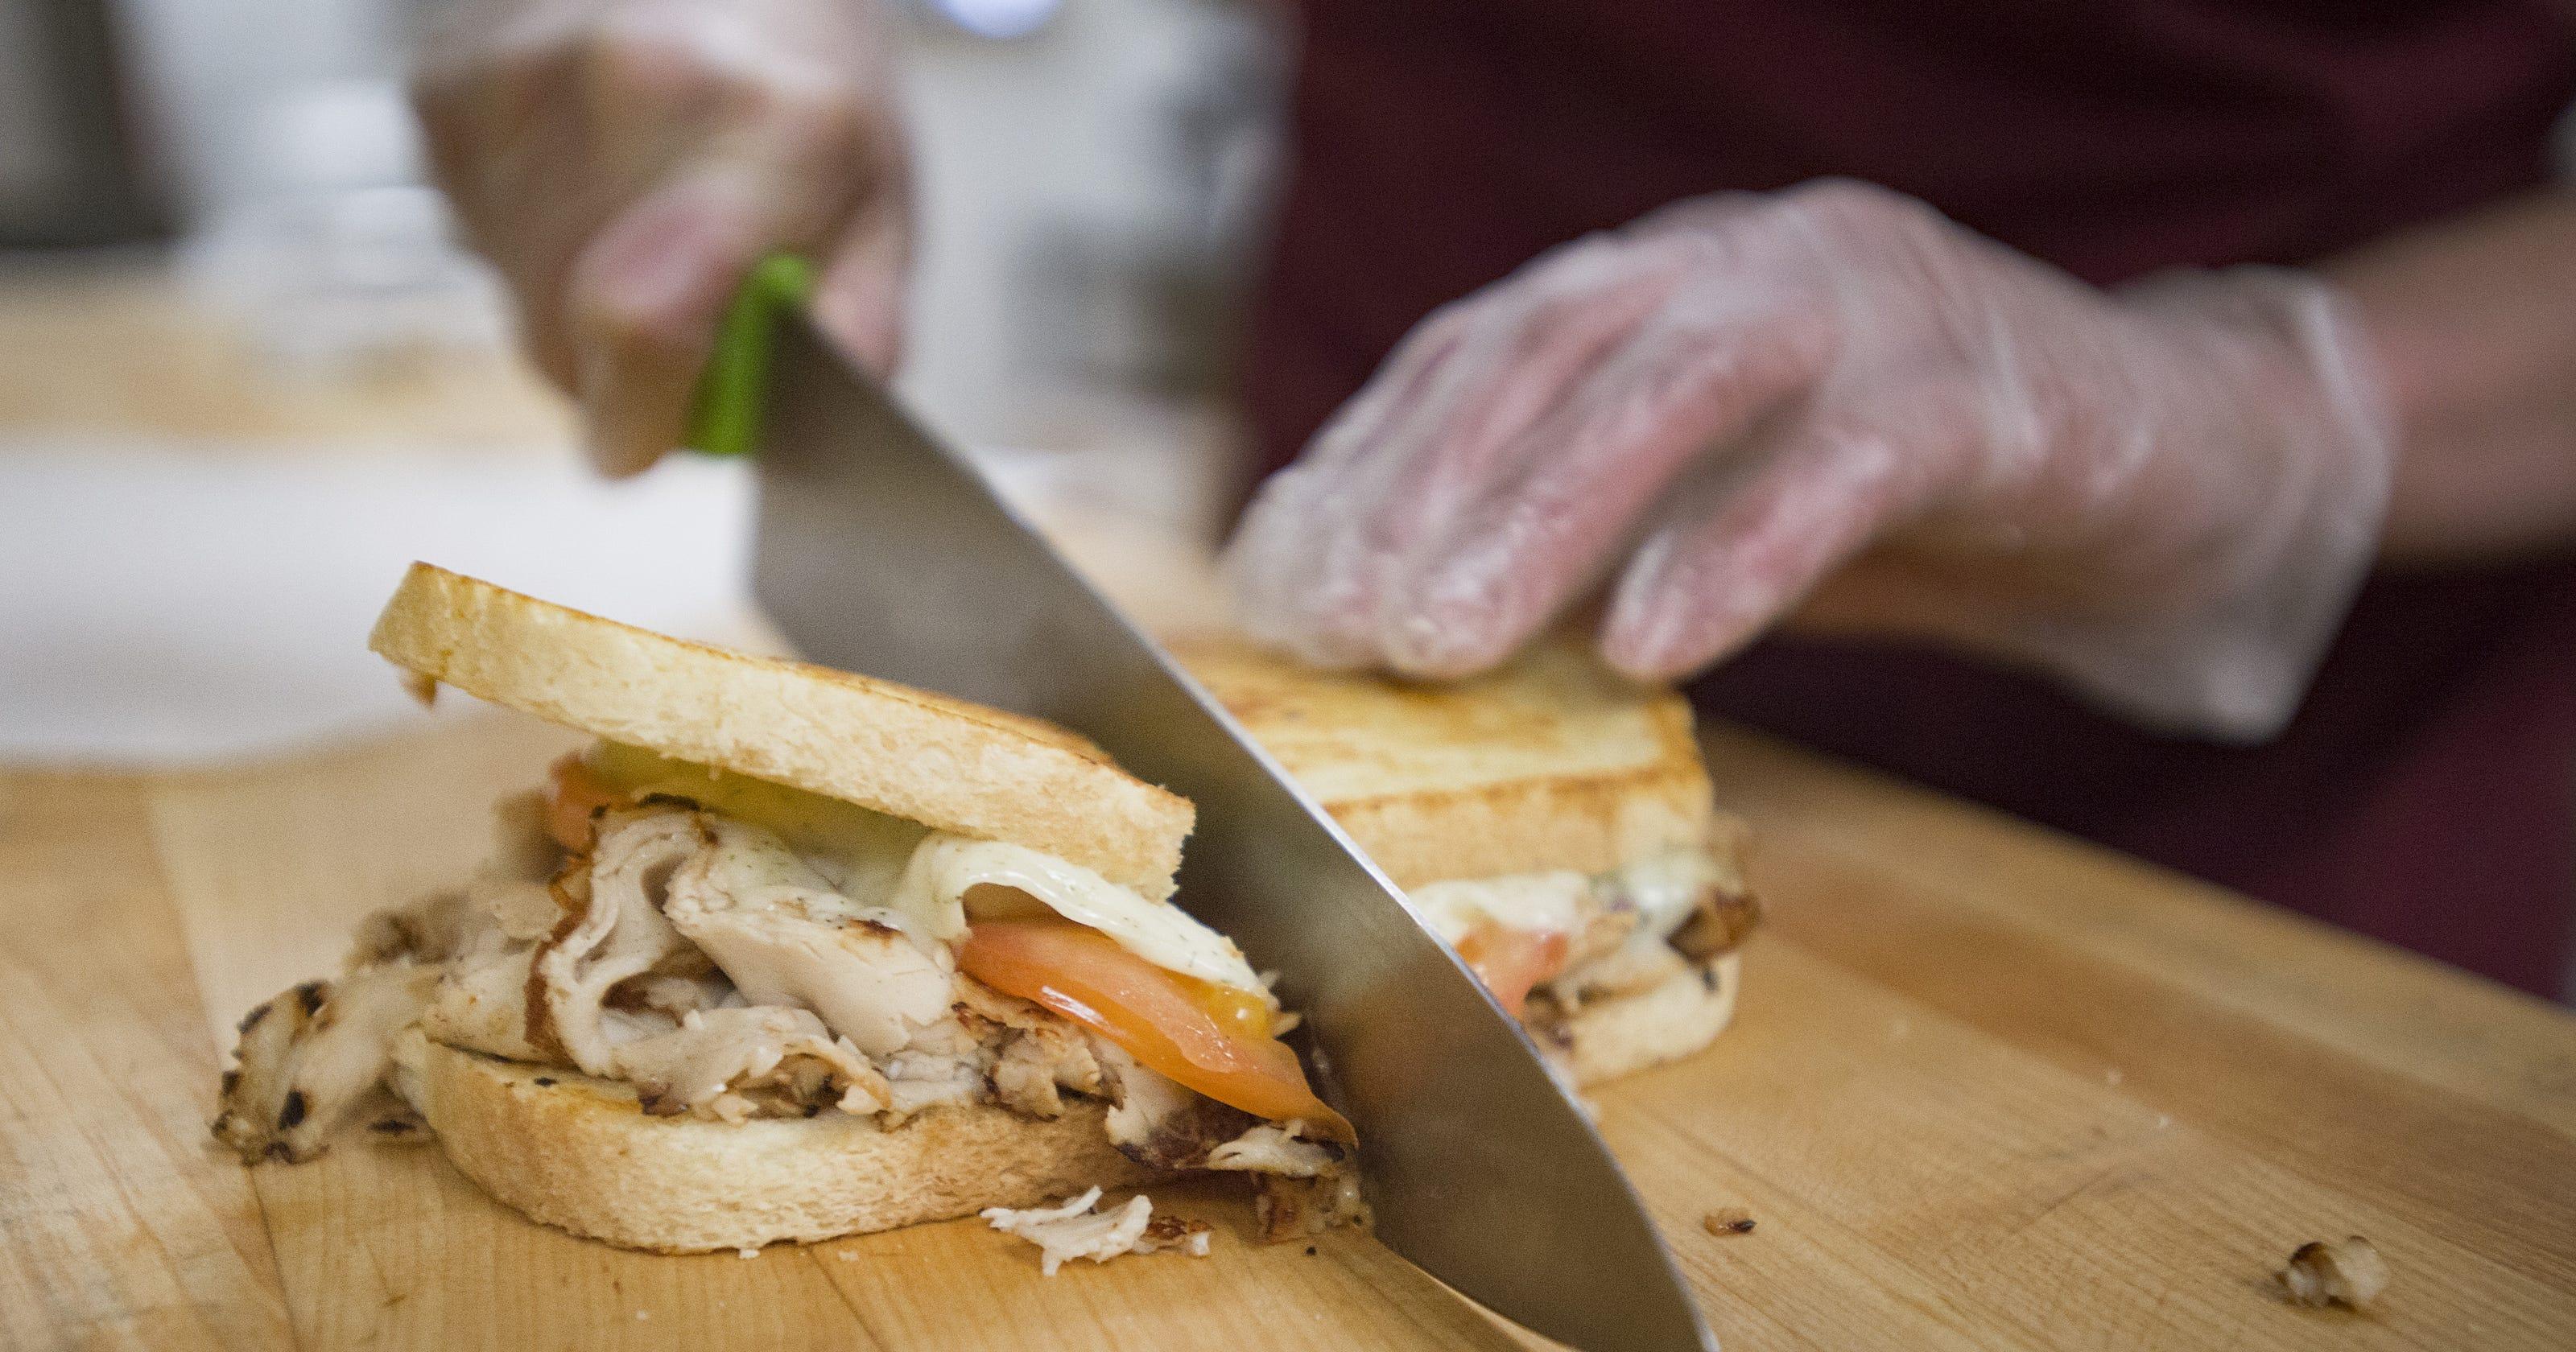 Best Fort Collins sandwich poll: What